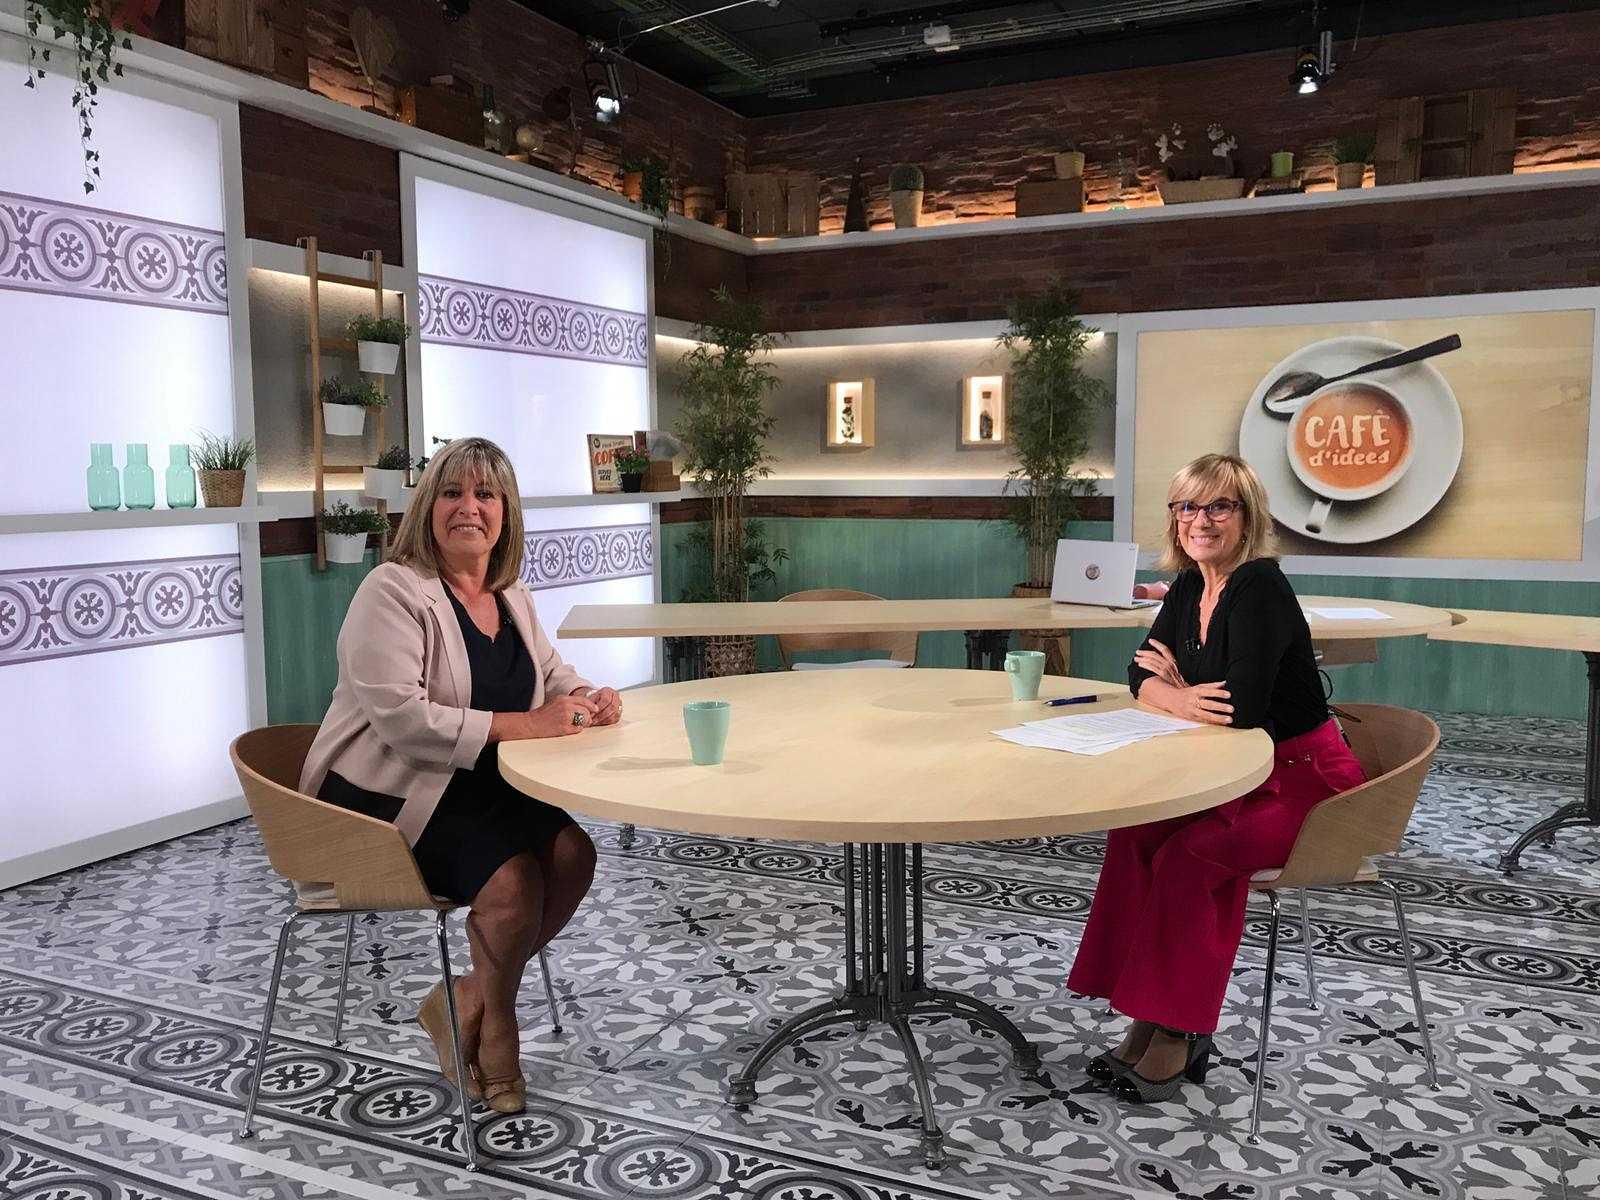 Cafè d'Idees - Entrevista a Núria Marín, Alcaldessa de l'Hospitalet